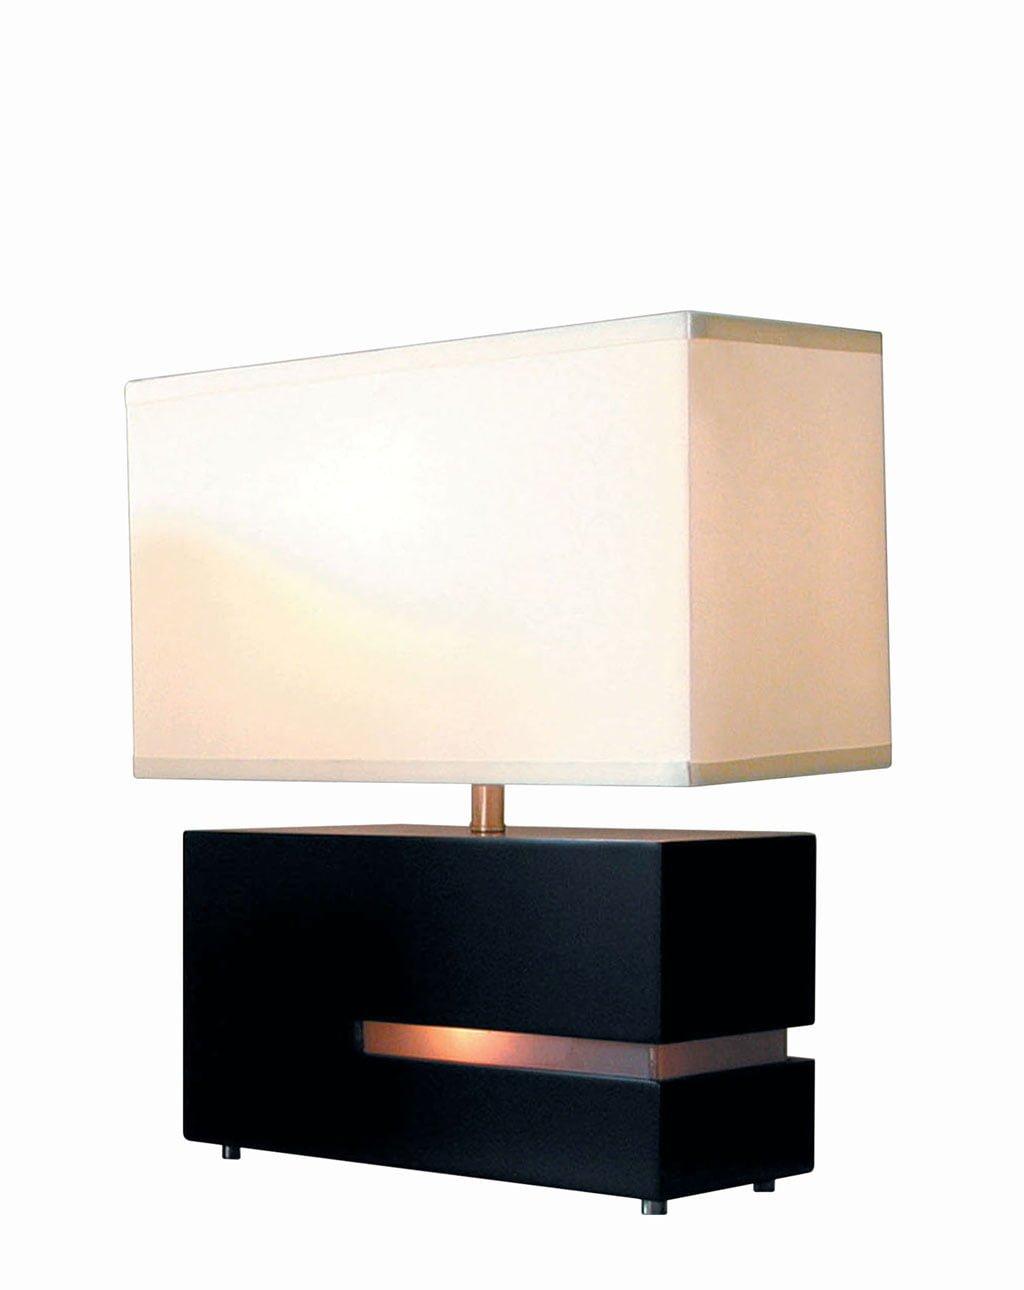 Zen Reclining Table Lamp, Brushed Nickel